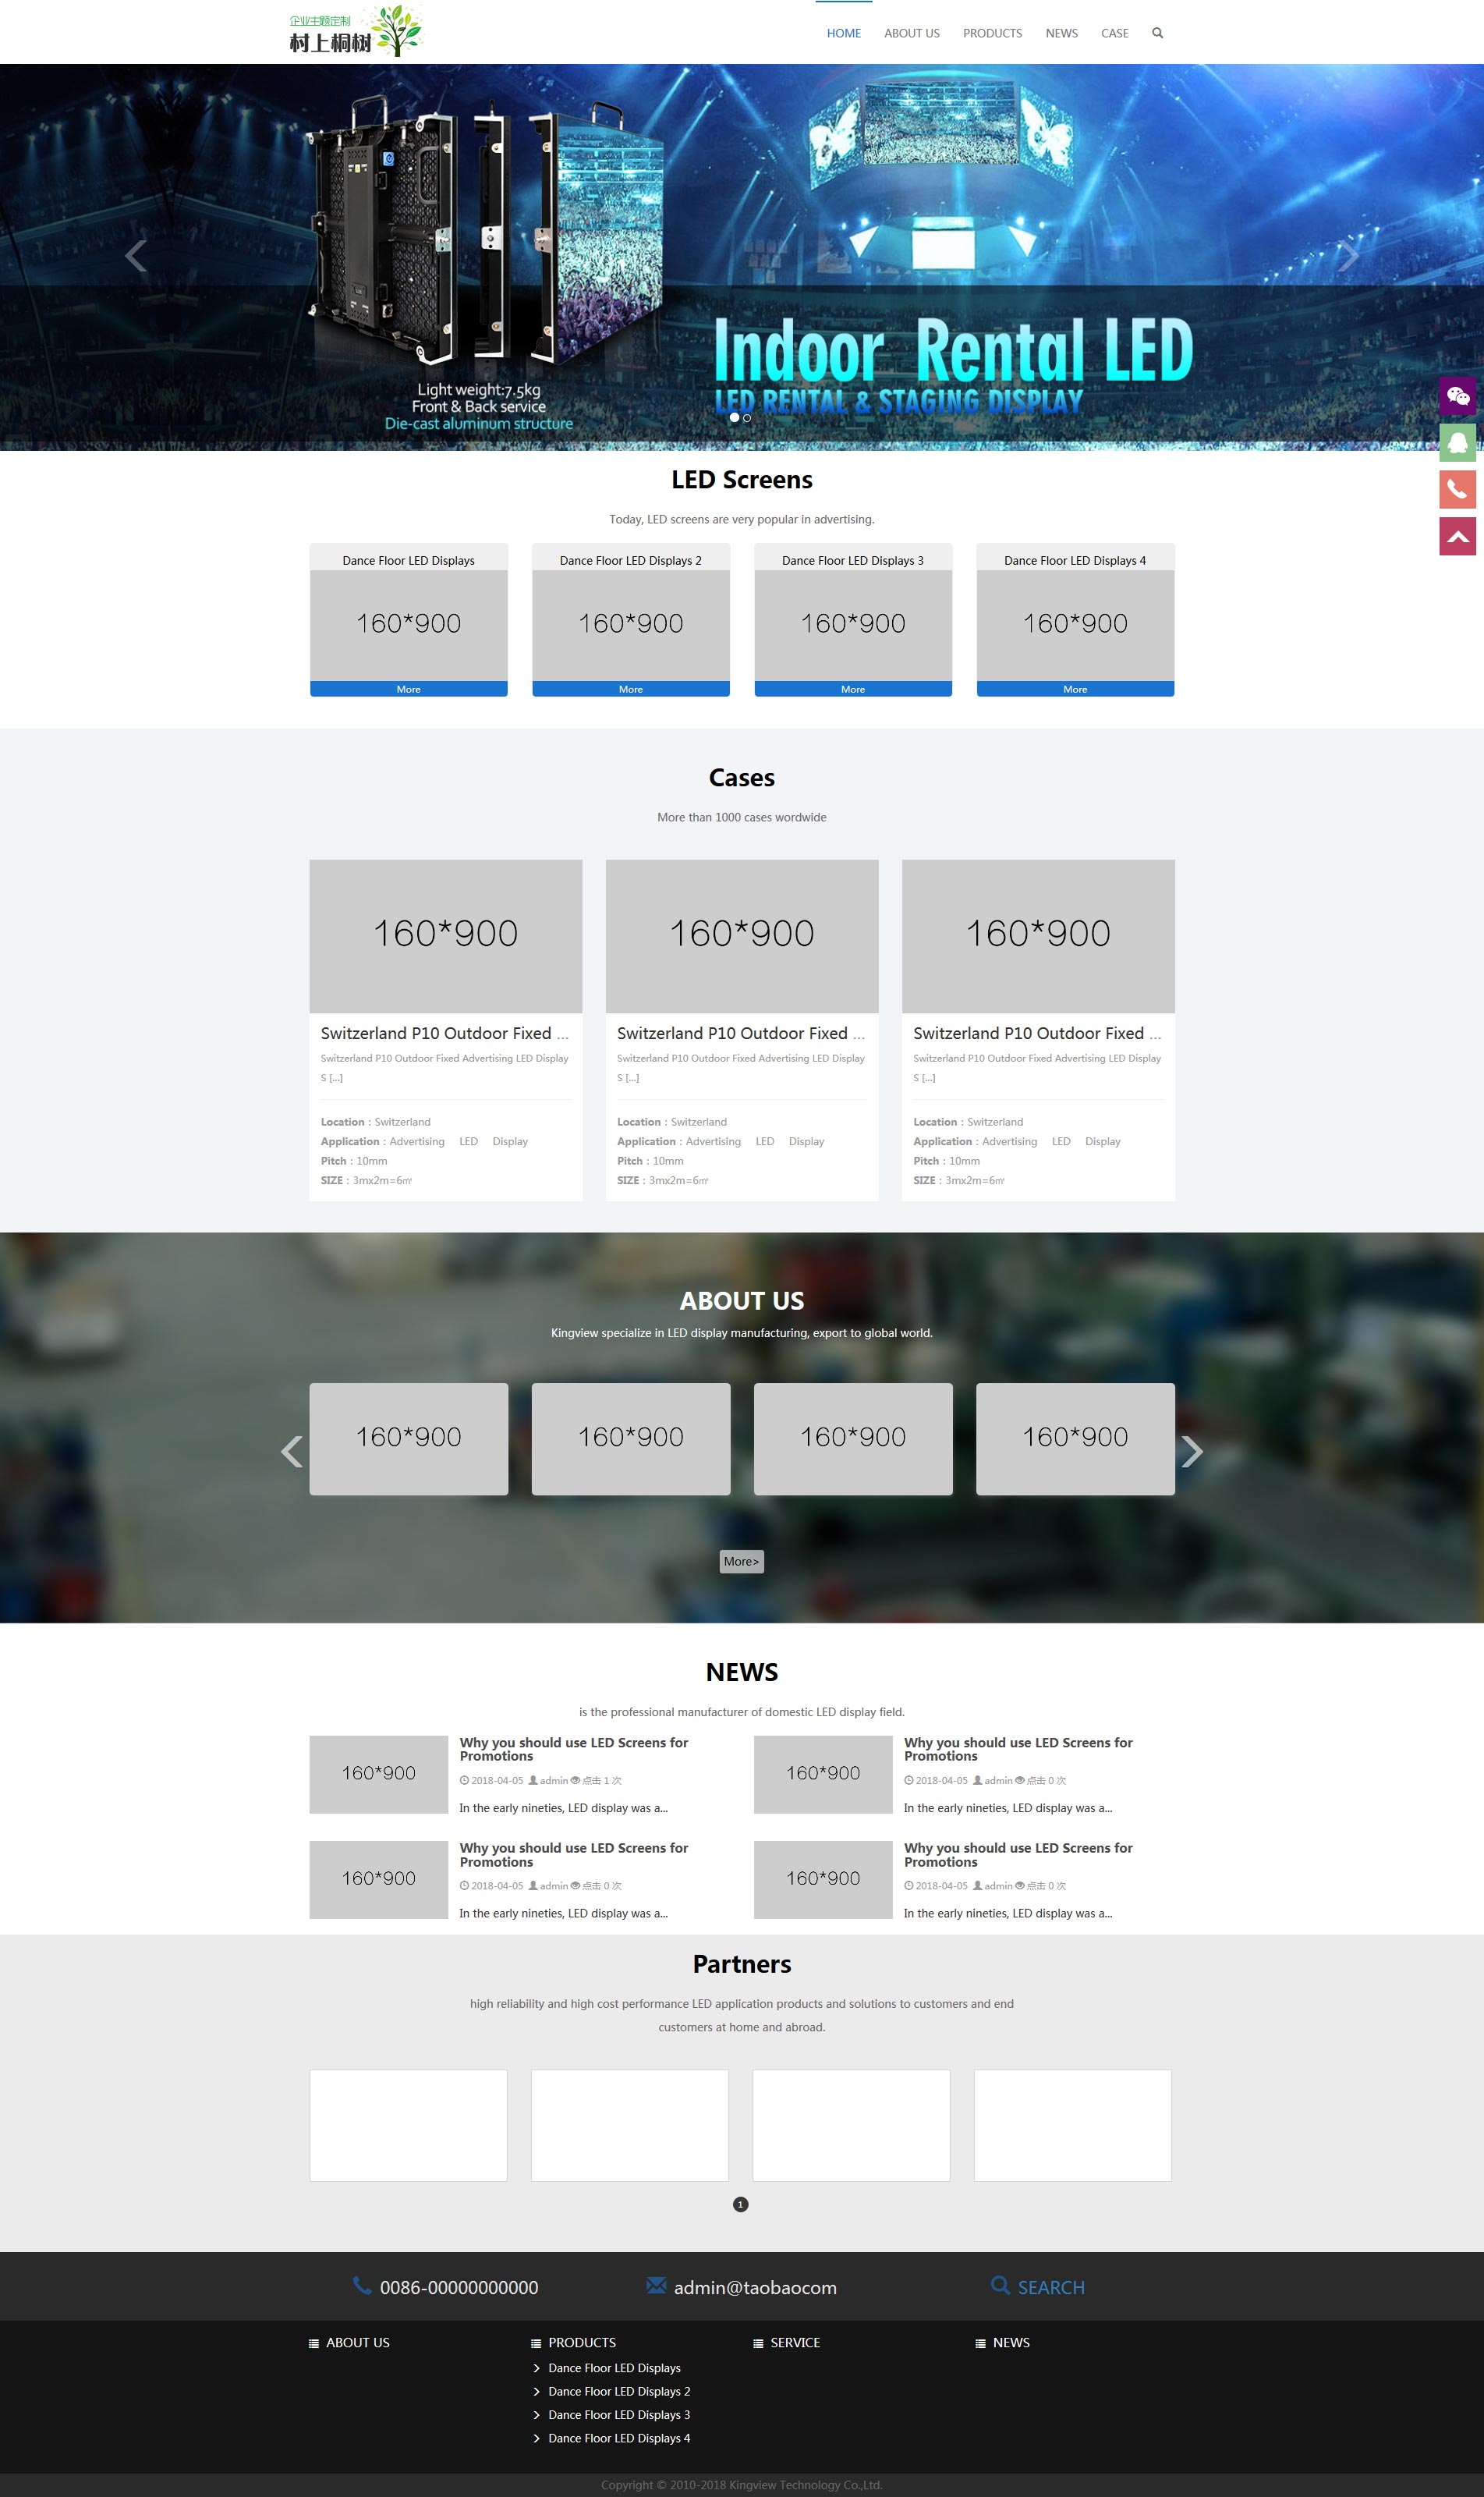 wordpress英文企业站主题,带案例、产品模型